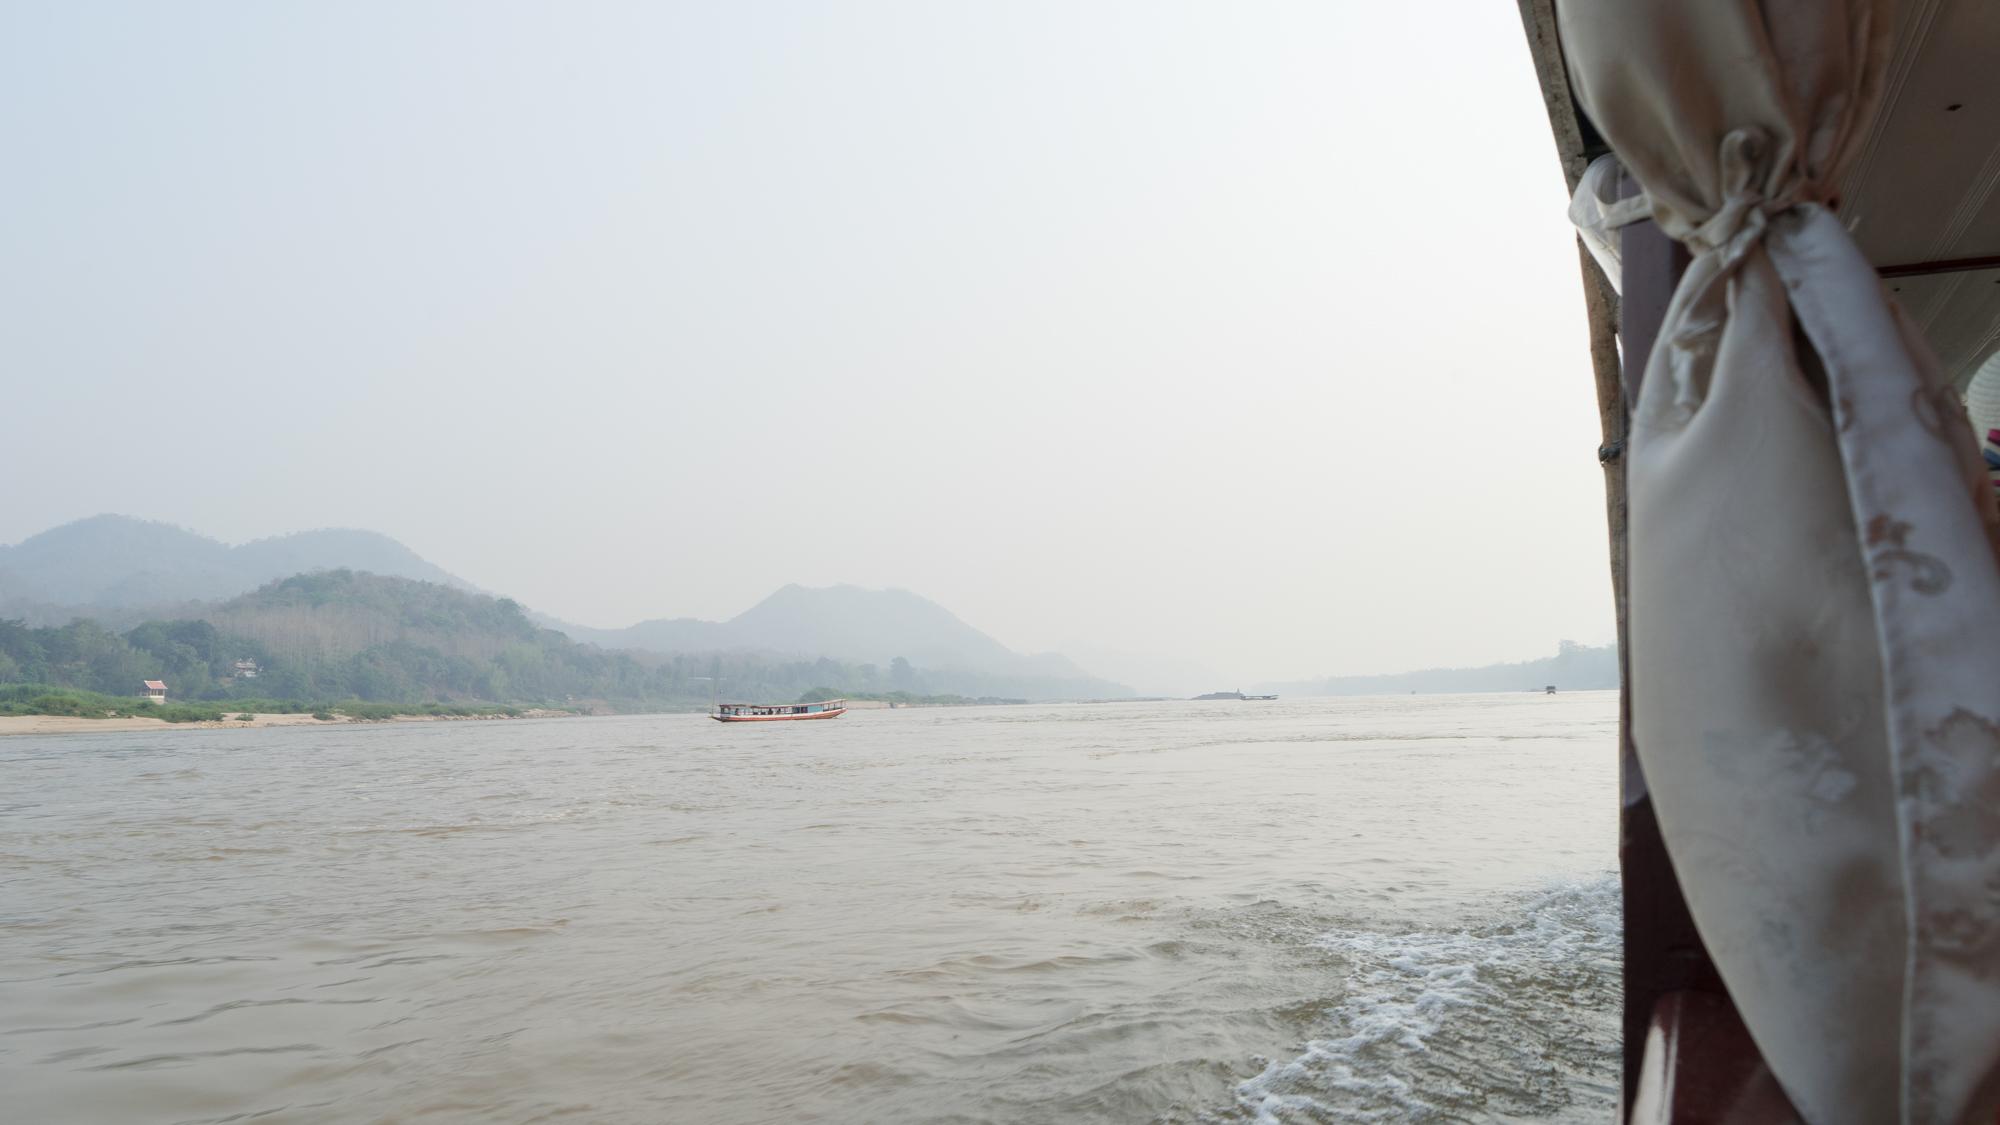 Daytripper365 Laos (31 of 39).jpg